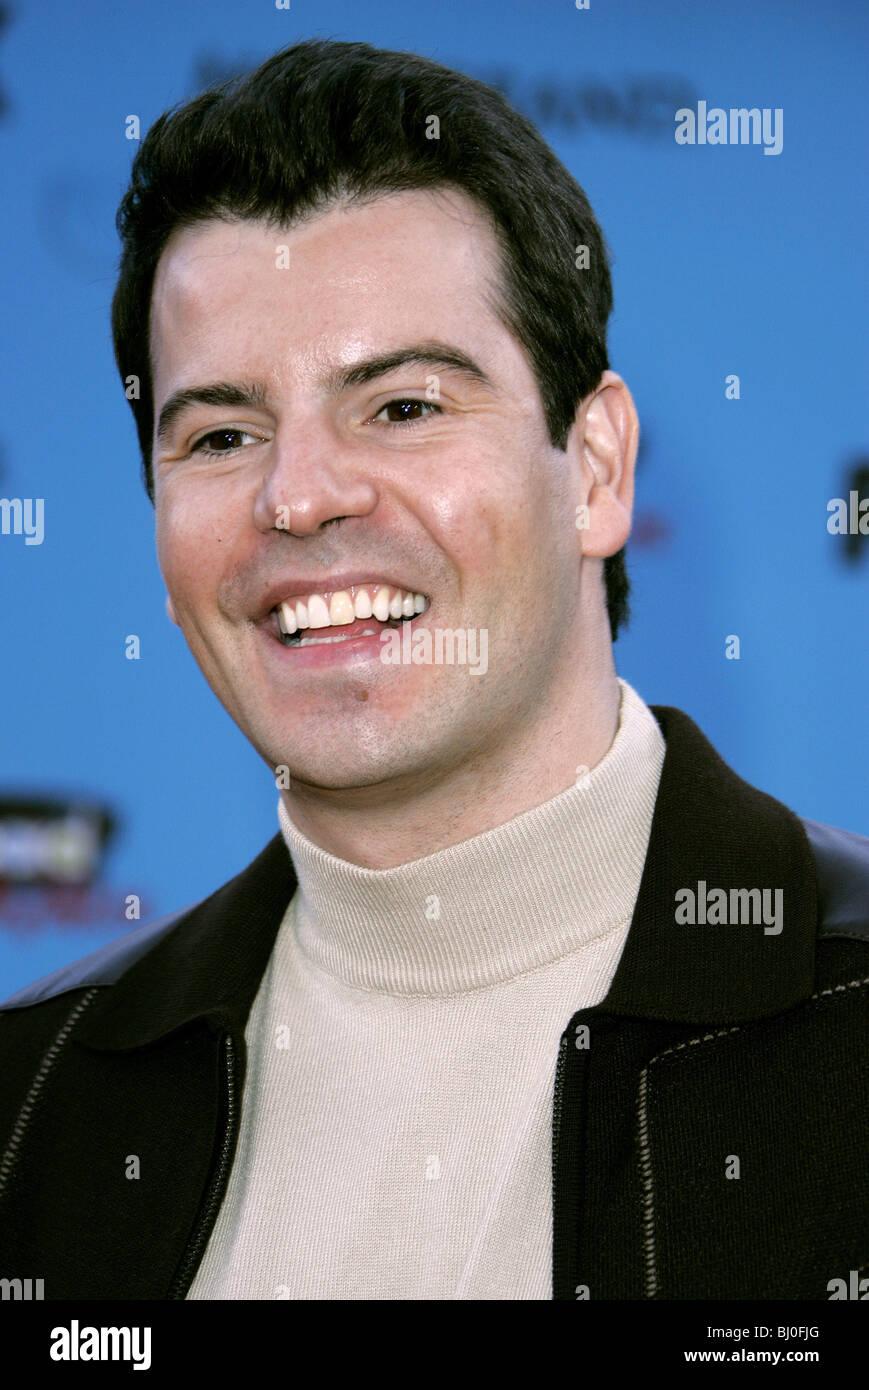 JORDAN KNIGHT SINGER MGM GRAND ARENA  LAS VEGAS  USA 06/12/2005 - Stock Image